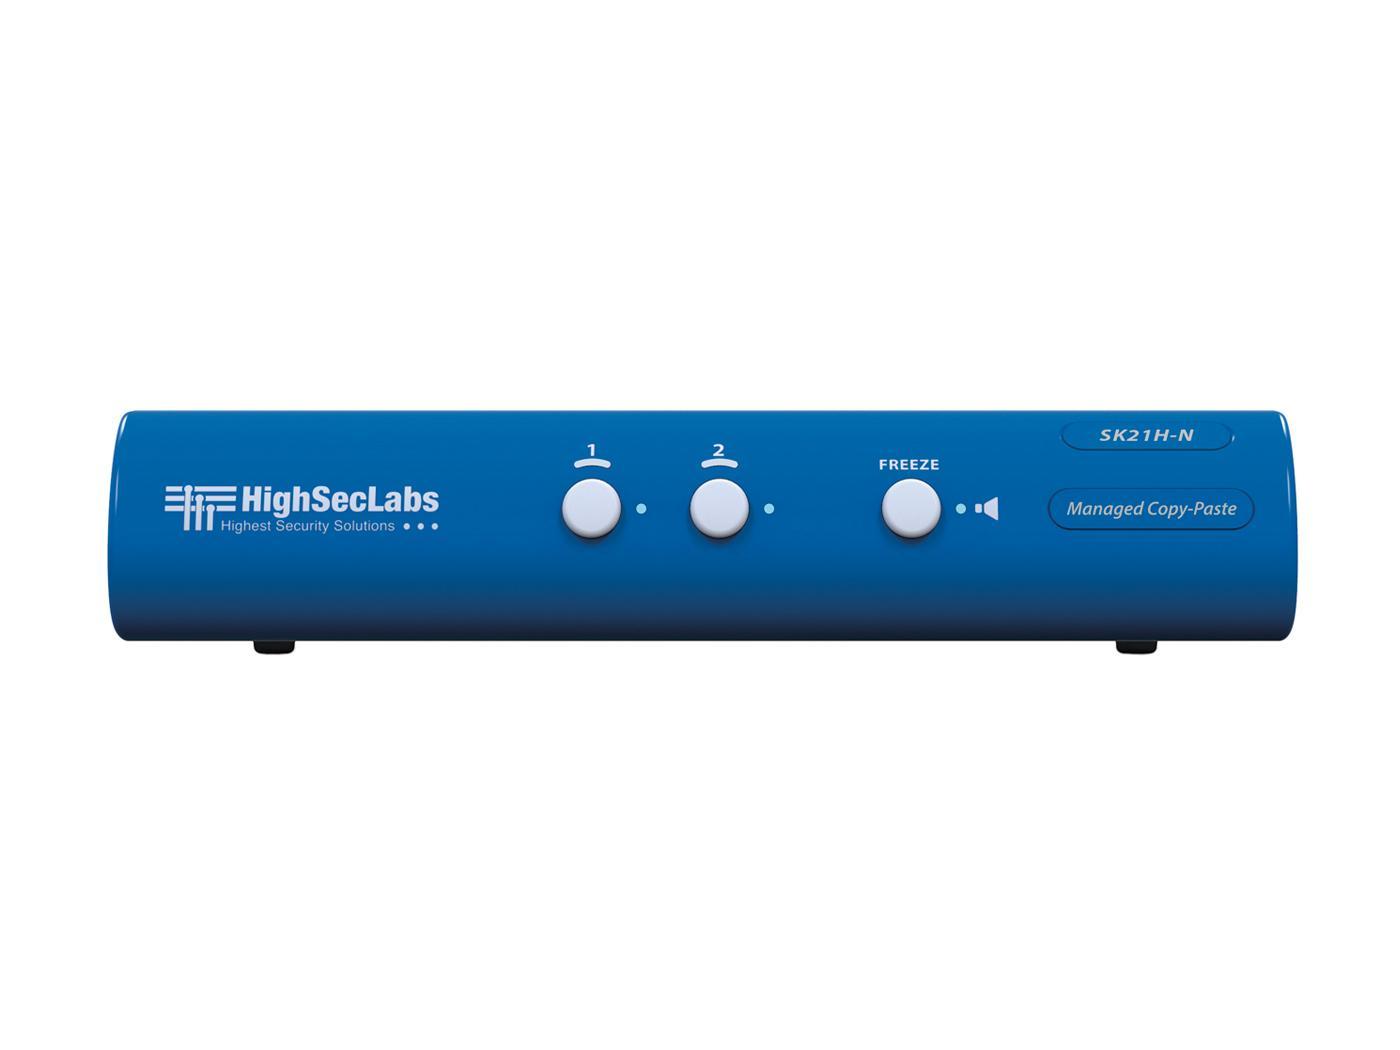 Kramer SK21H-N HighSecLabs 2-Port 4K30 UHD HDMI KVM Switch